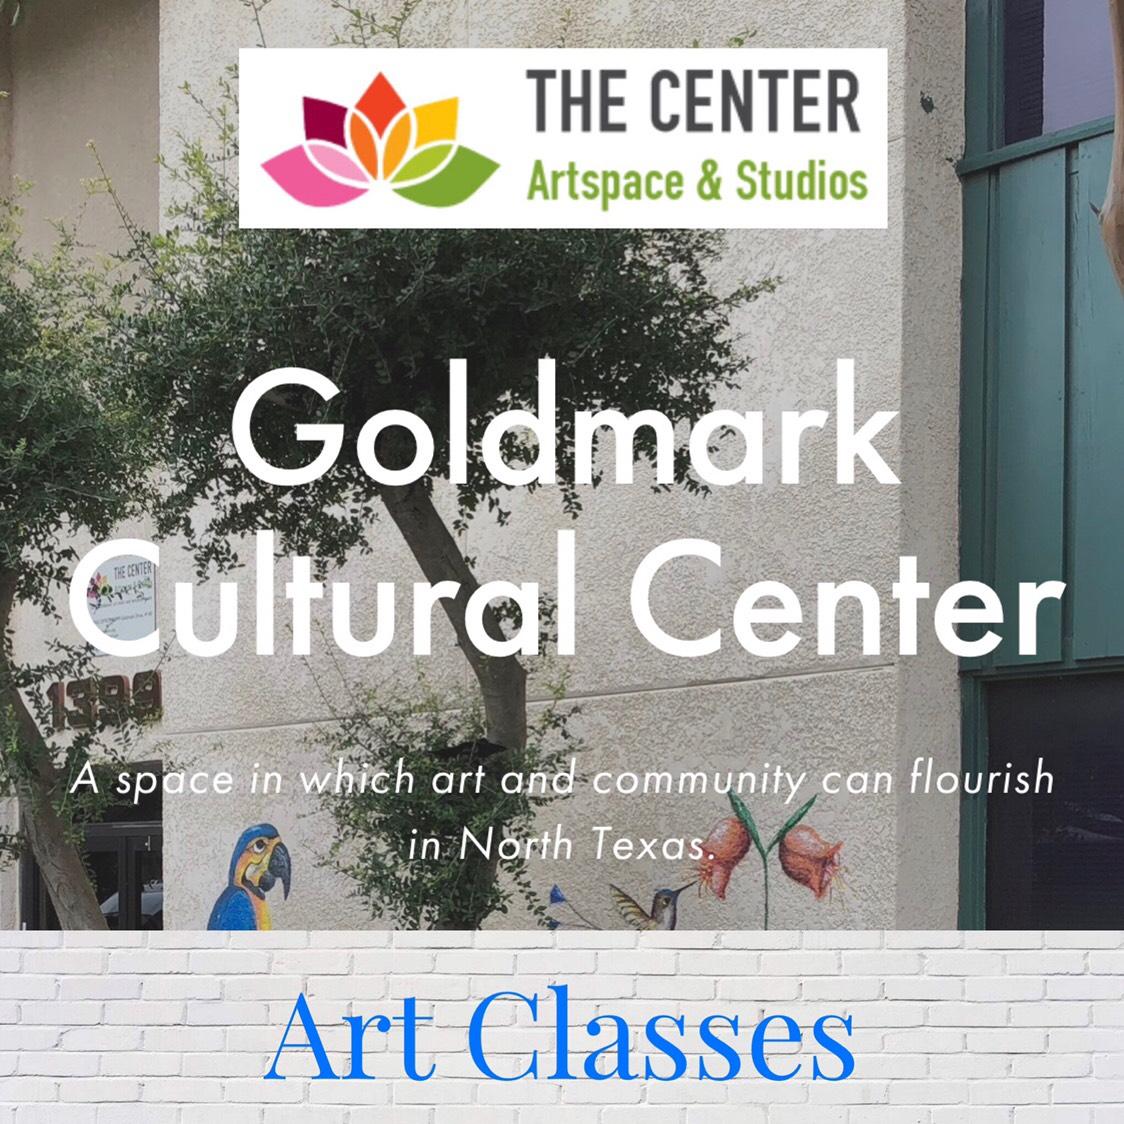 Art&Seek | Arts, Music, Culture for North Texas